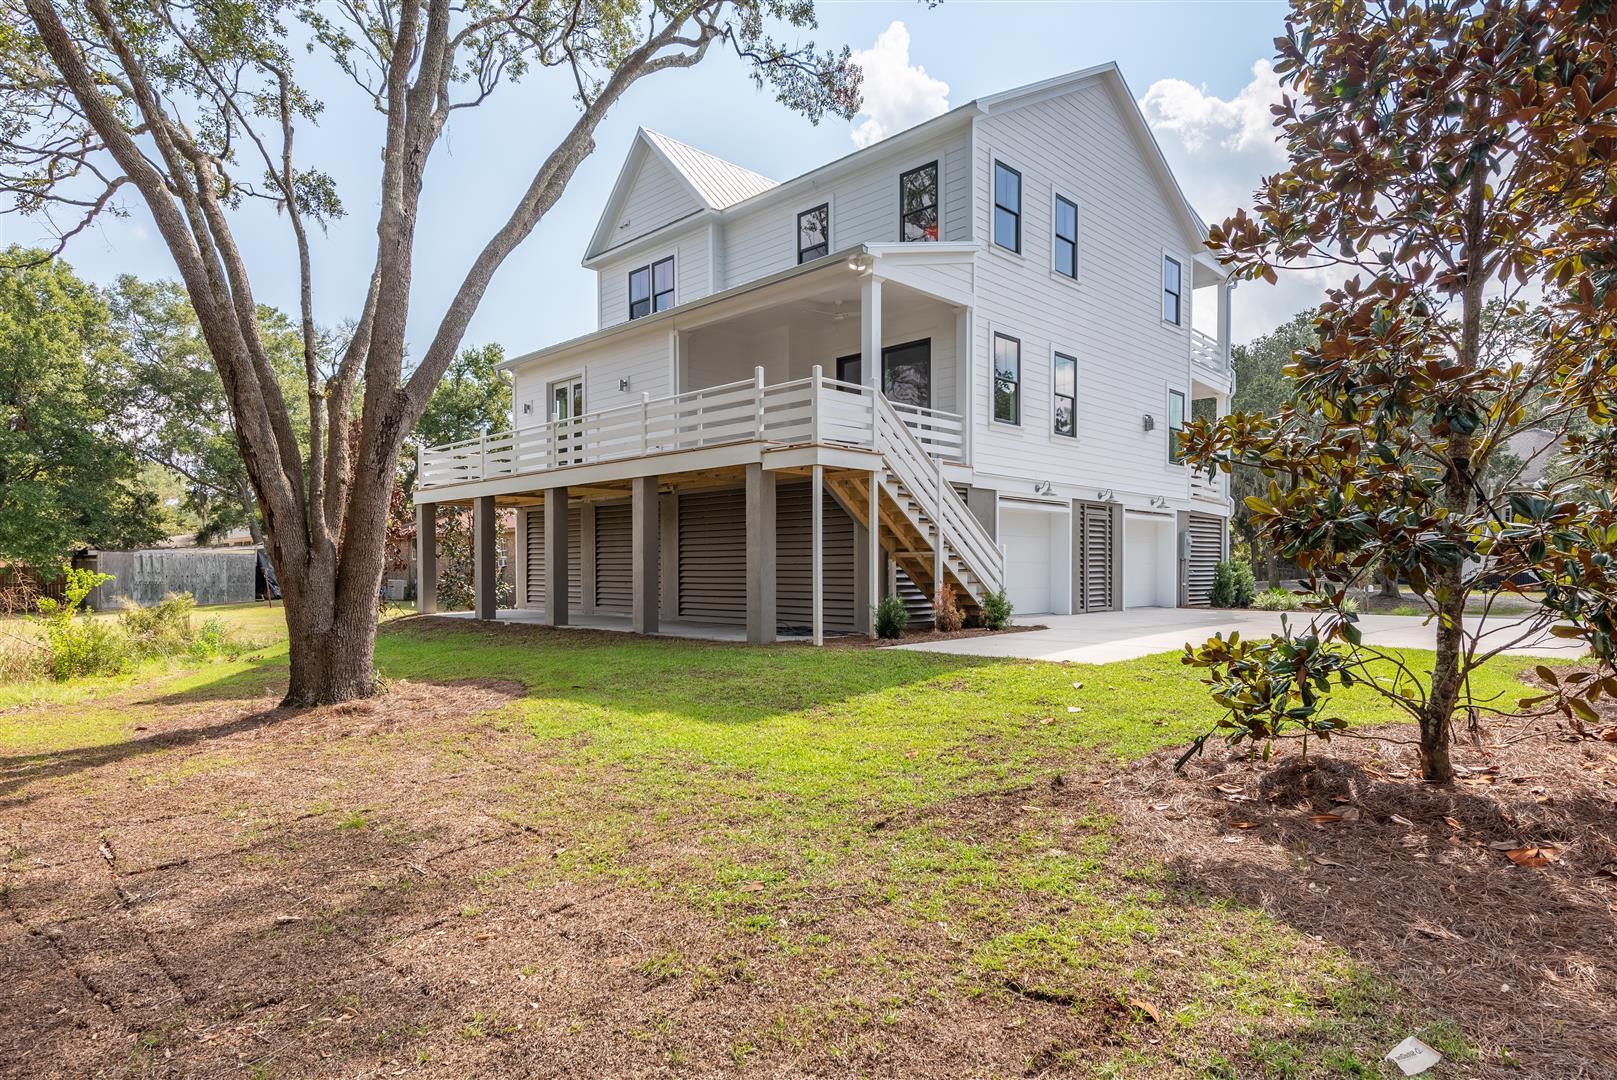 Scanlonville Homes For Sale - 160 5th, Mount Pleasant, SC - 22